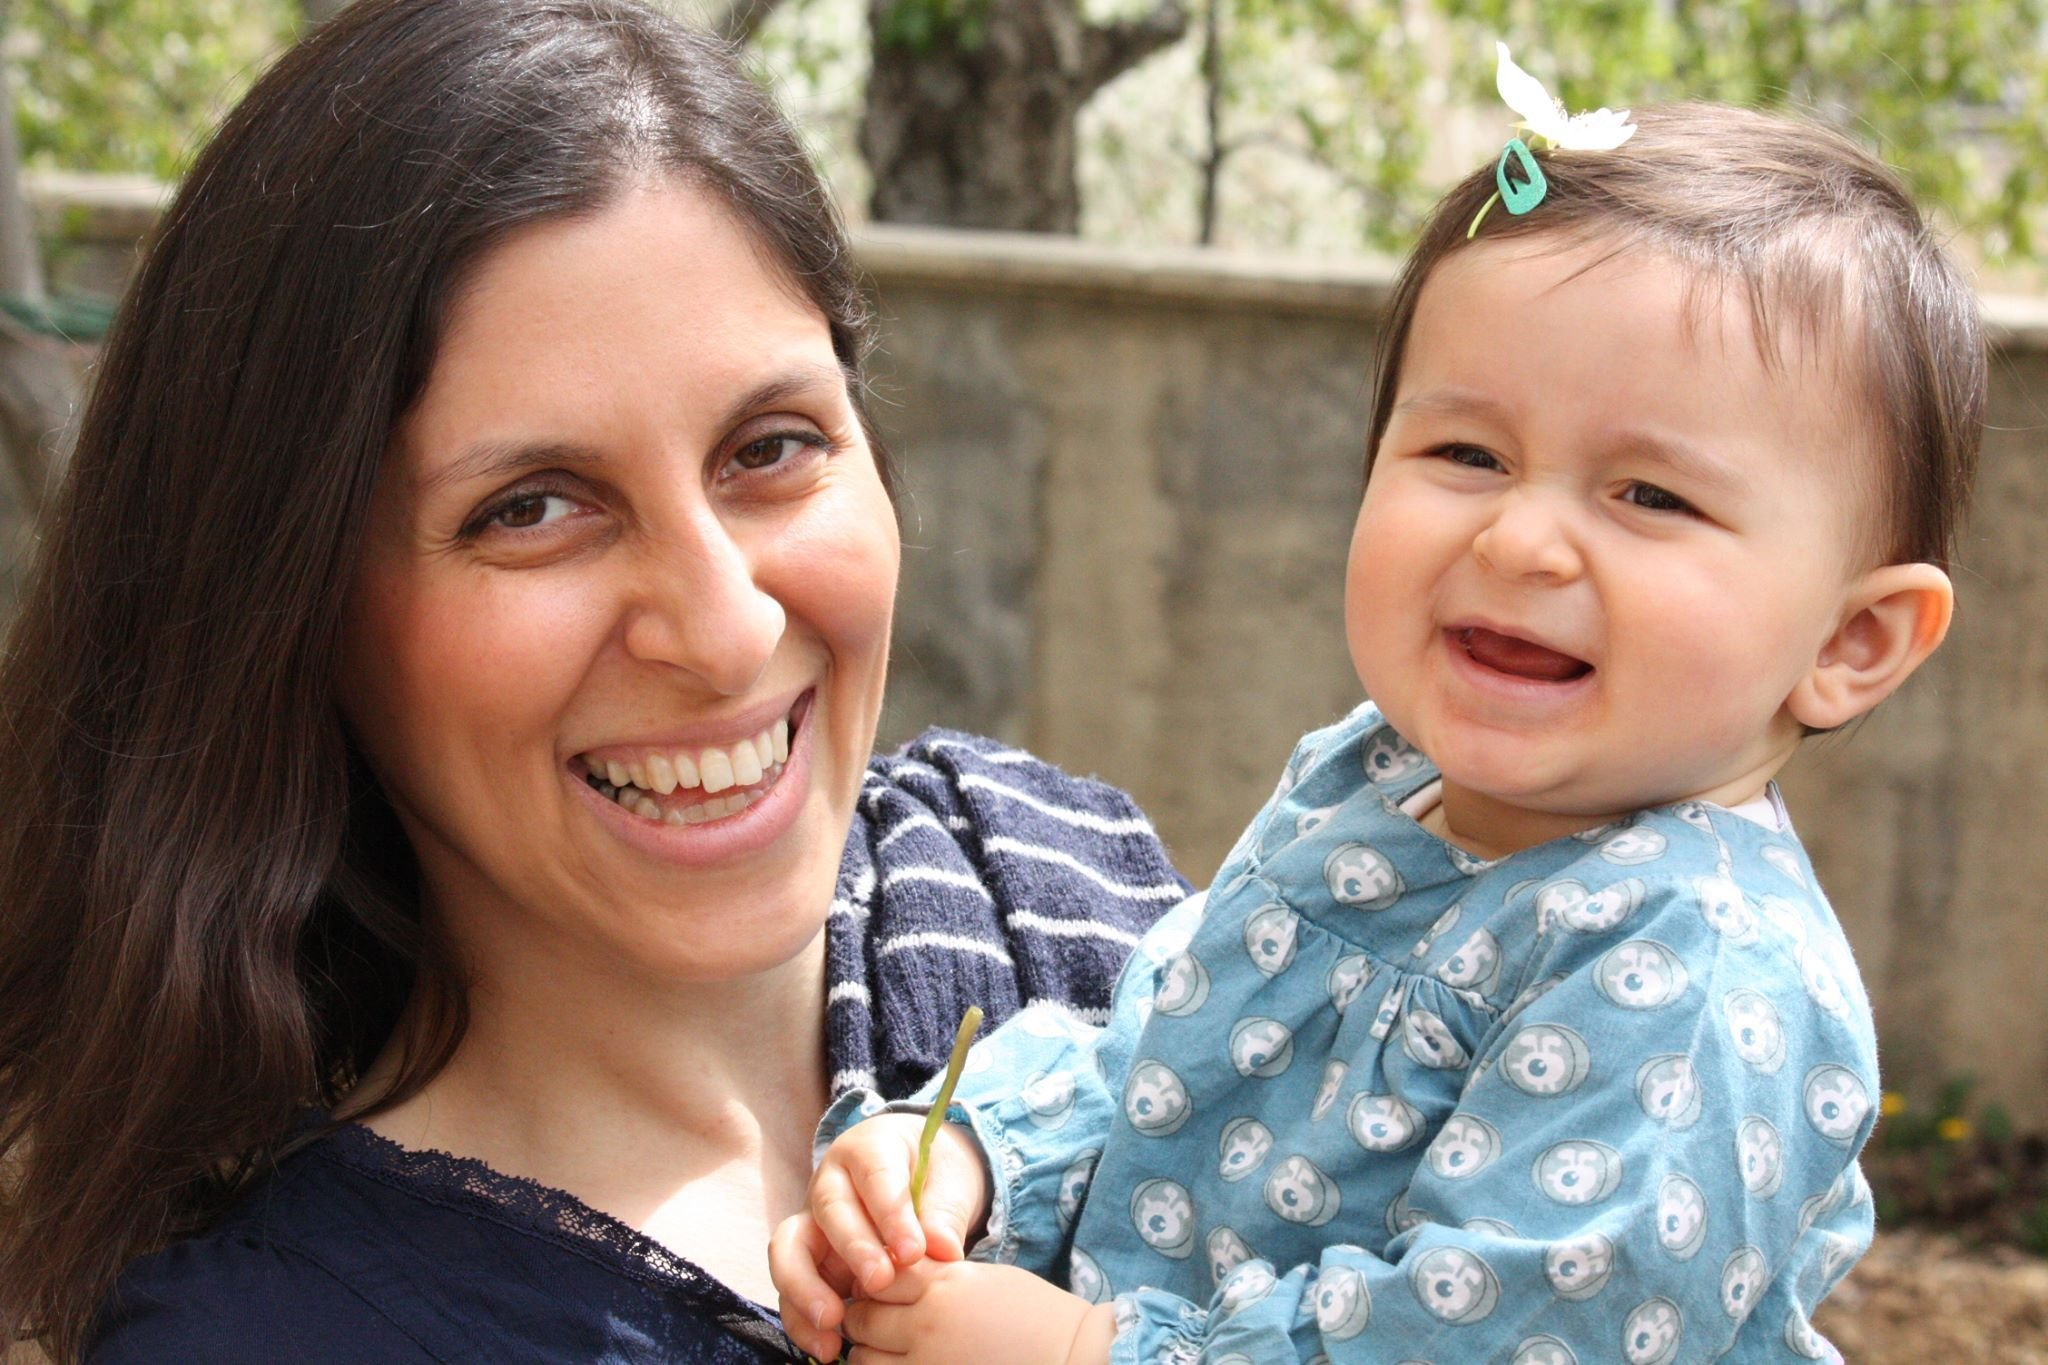 Has 'hidden agenda' kept 'innocent' British mother in jail in Iran for a year?